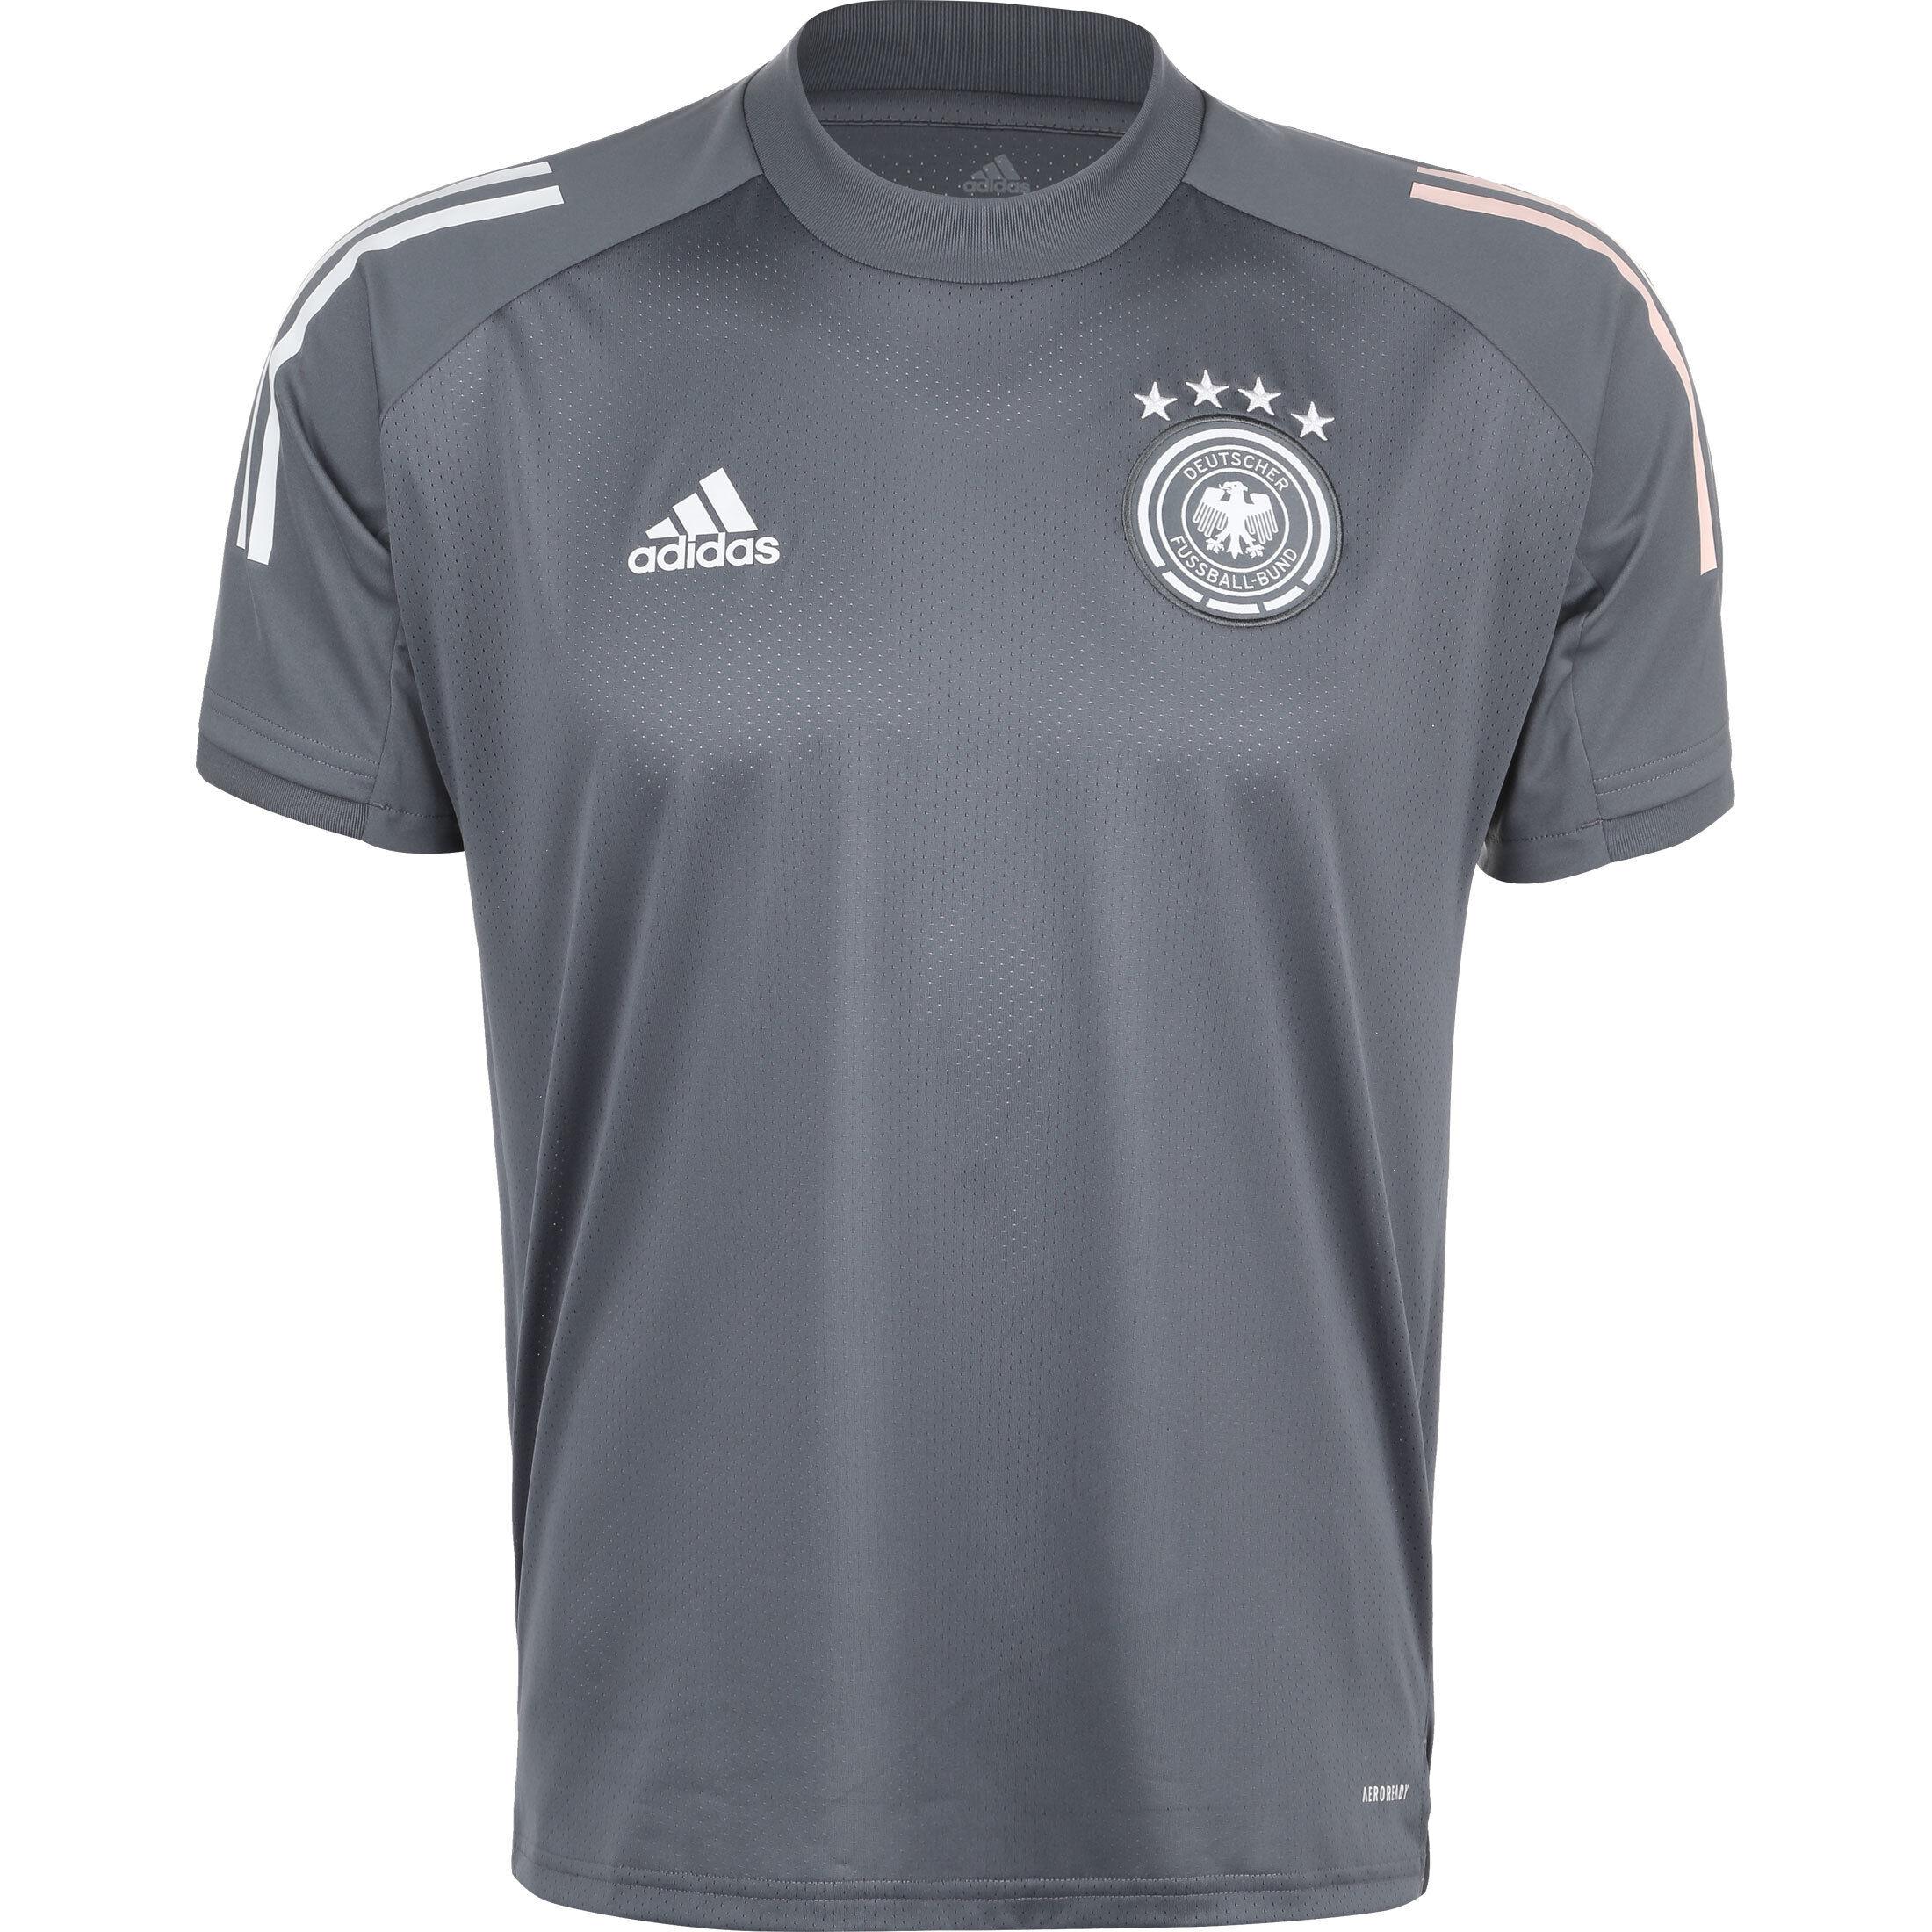 adidas Performance DFB Trikot Home EM 2021 Herren bei OUTFITTER